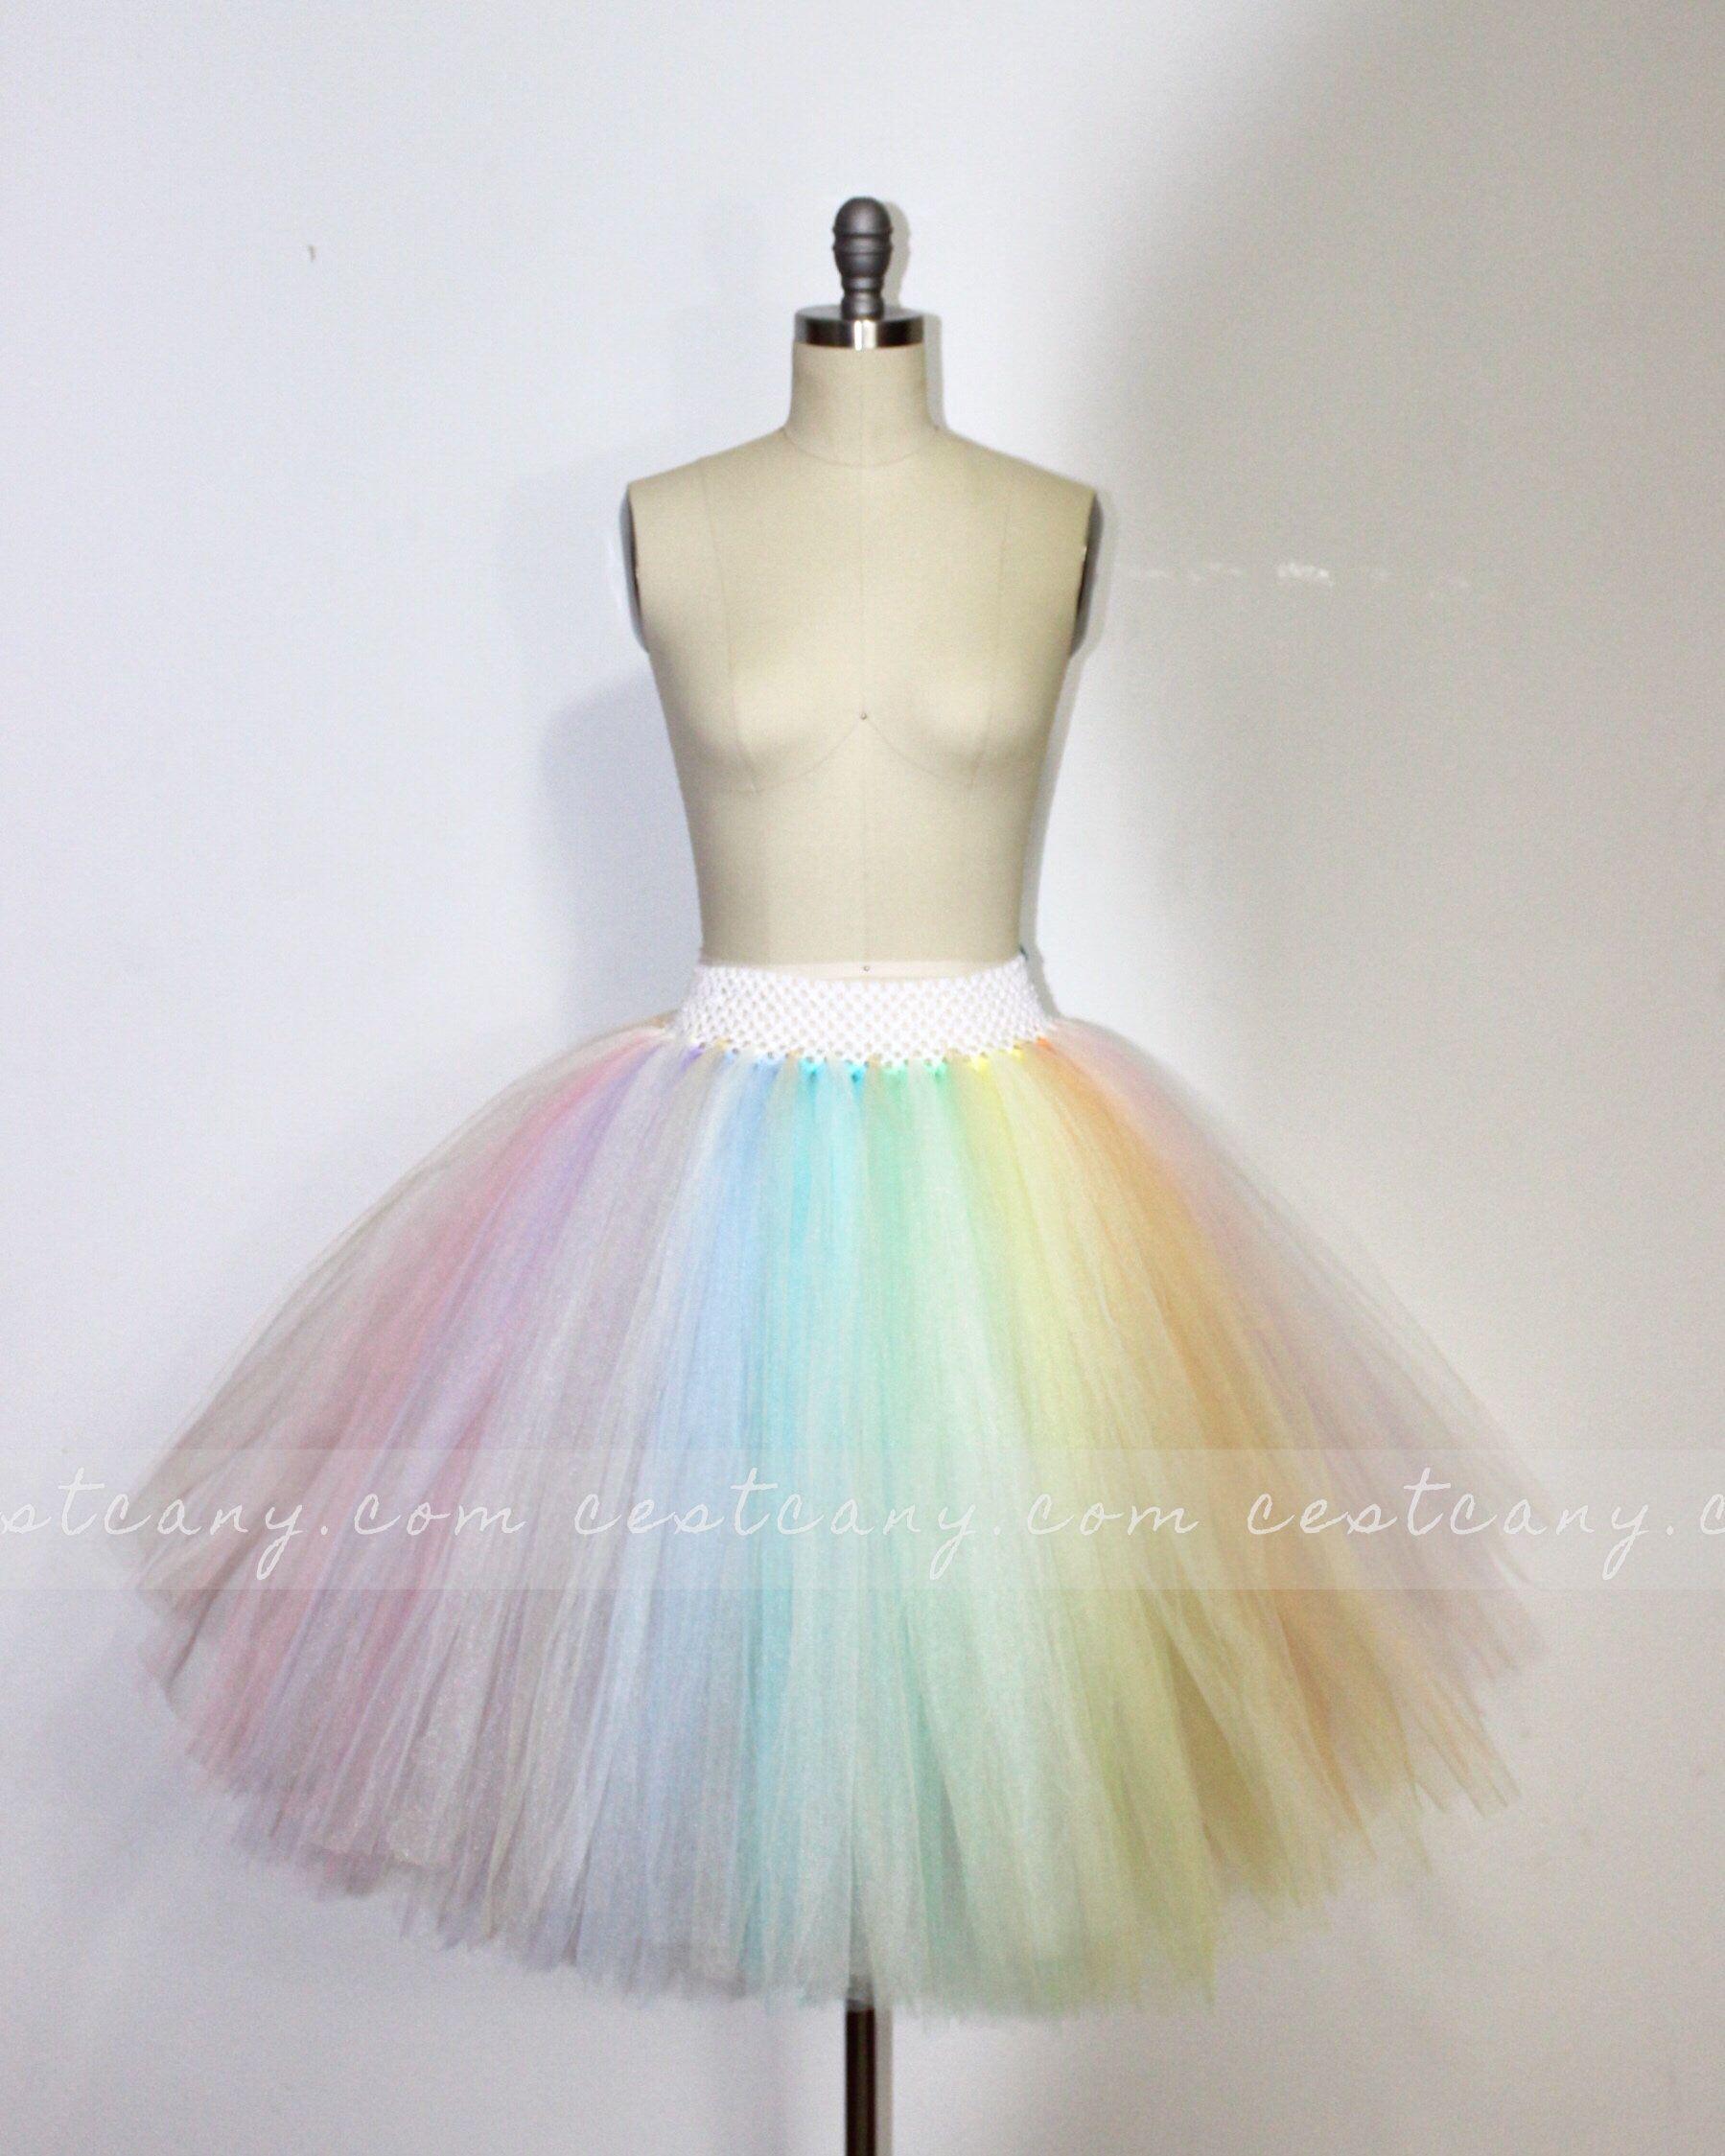 CHILDRENS PETTICOAT Fluffy Tulle Layered crinoline Childs Costume tutu S//M M//L